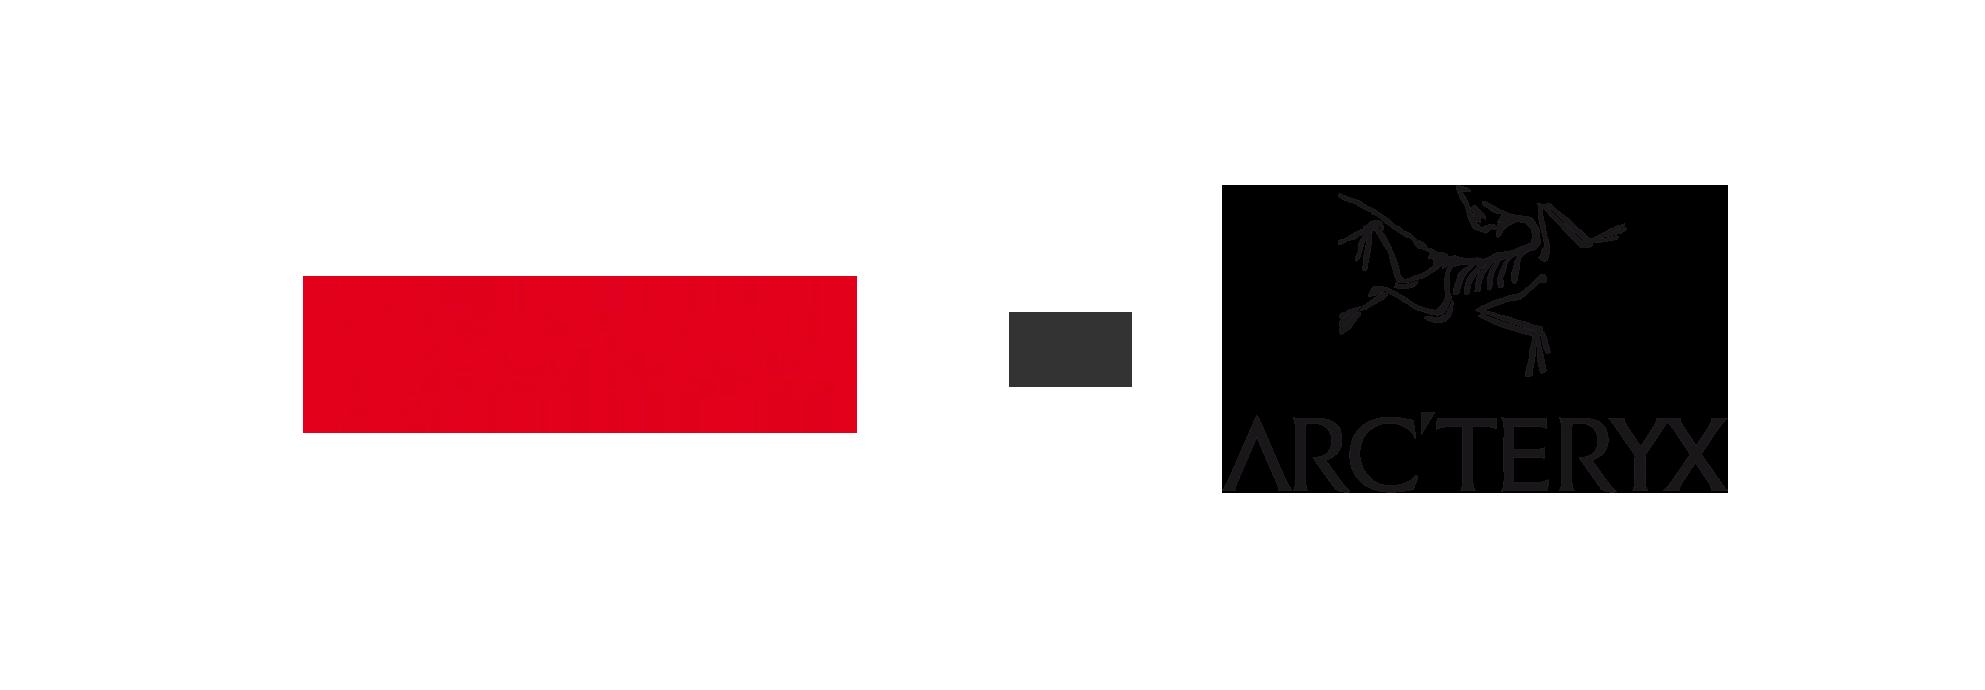 Mammut vs. Arcteryx header